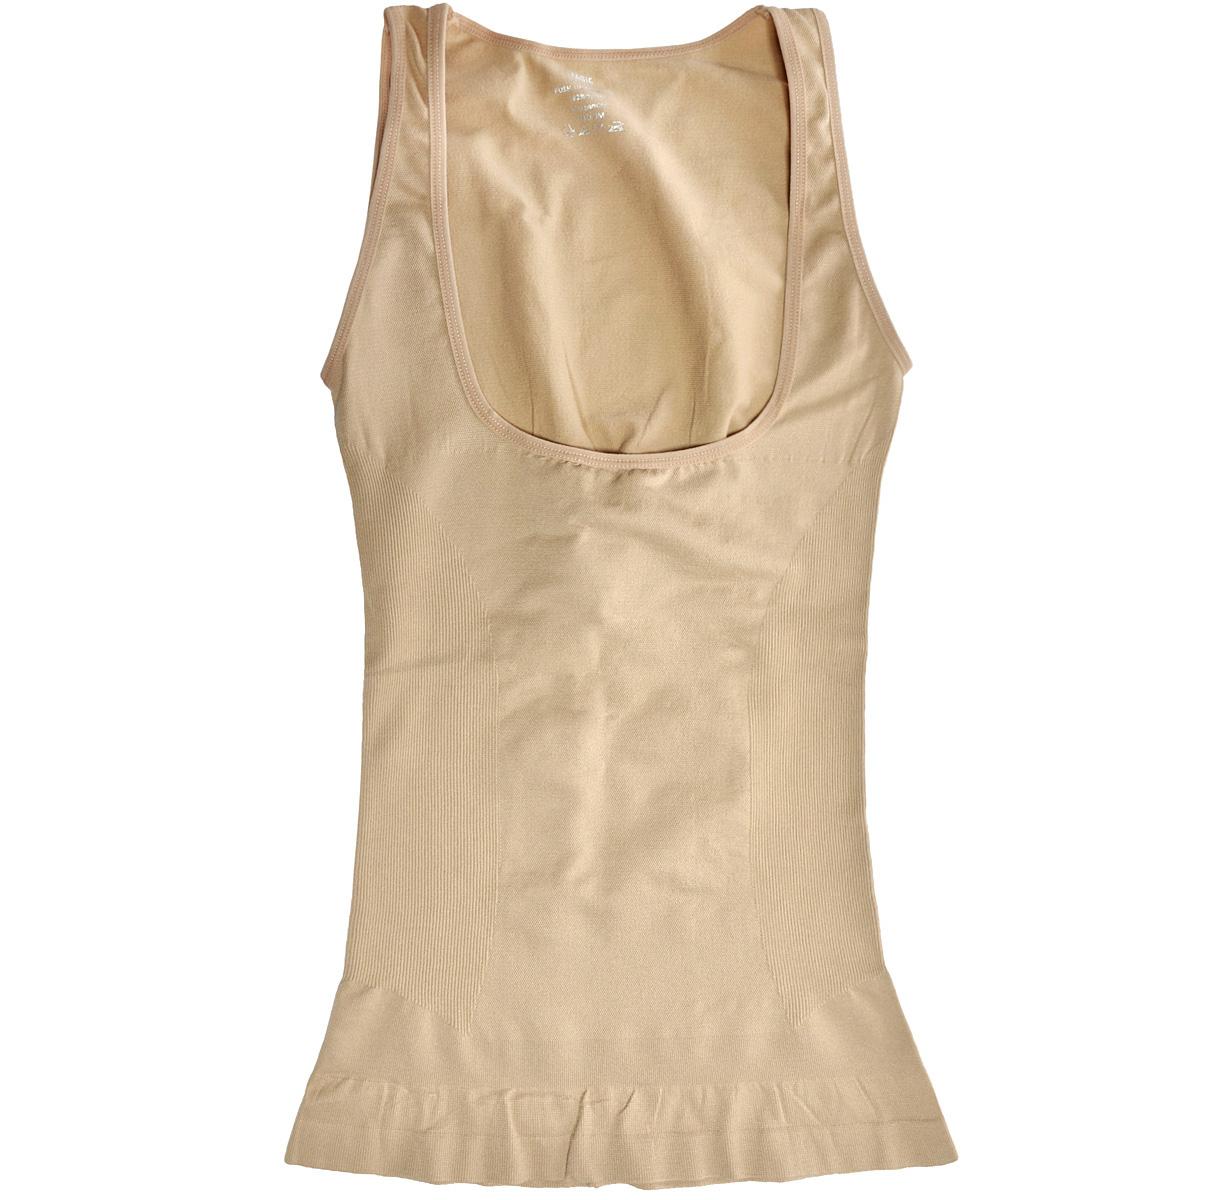 Майка женская Magic BodyFashion Push-Up Camisole, корректирующая, цвет: бежевый. 40CA. Размер XL (50)